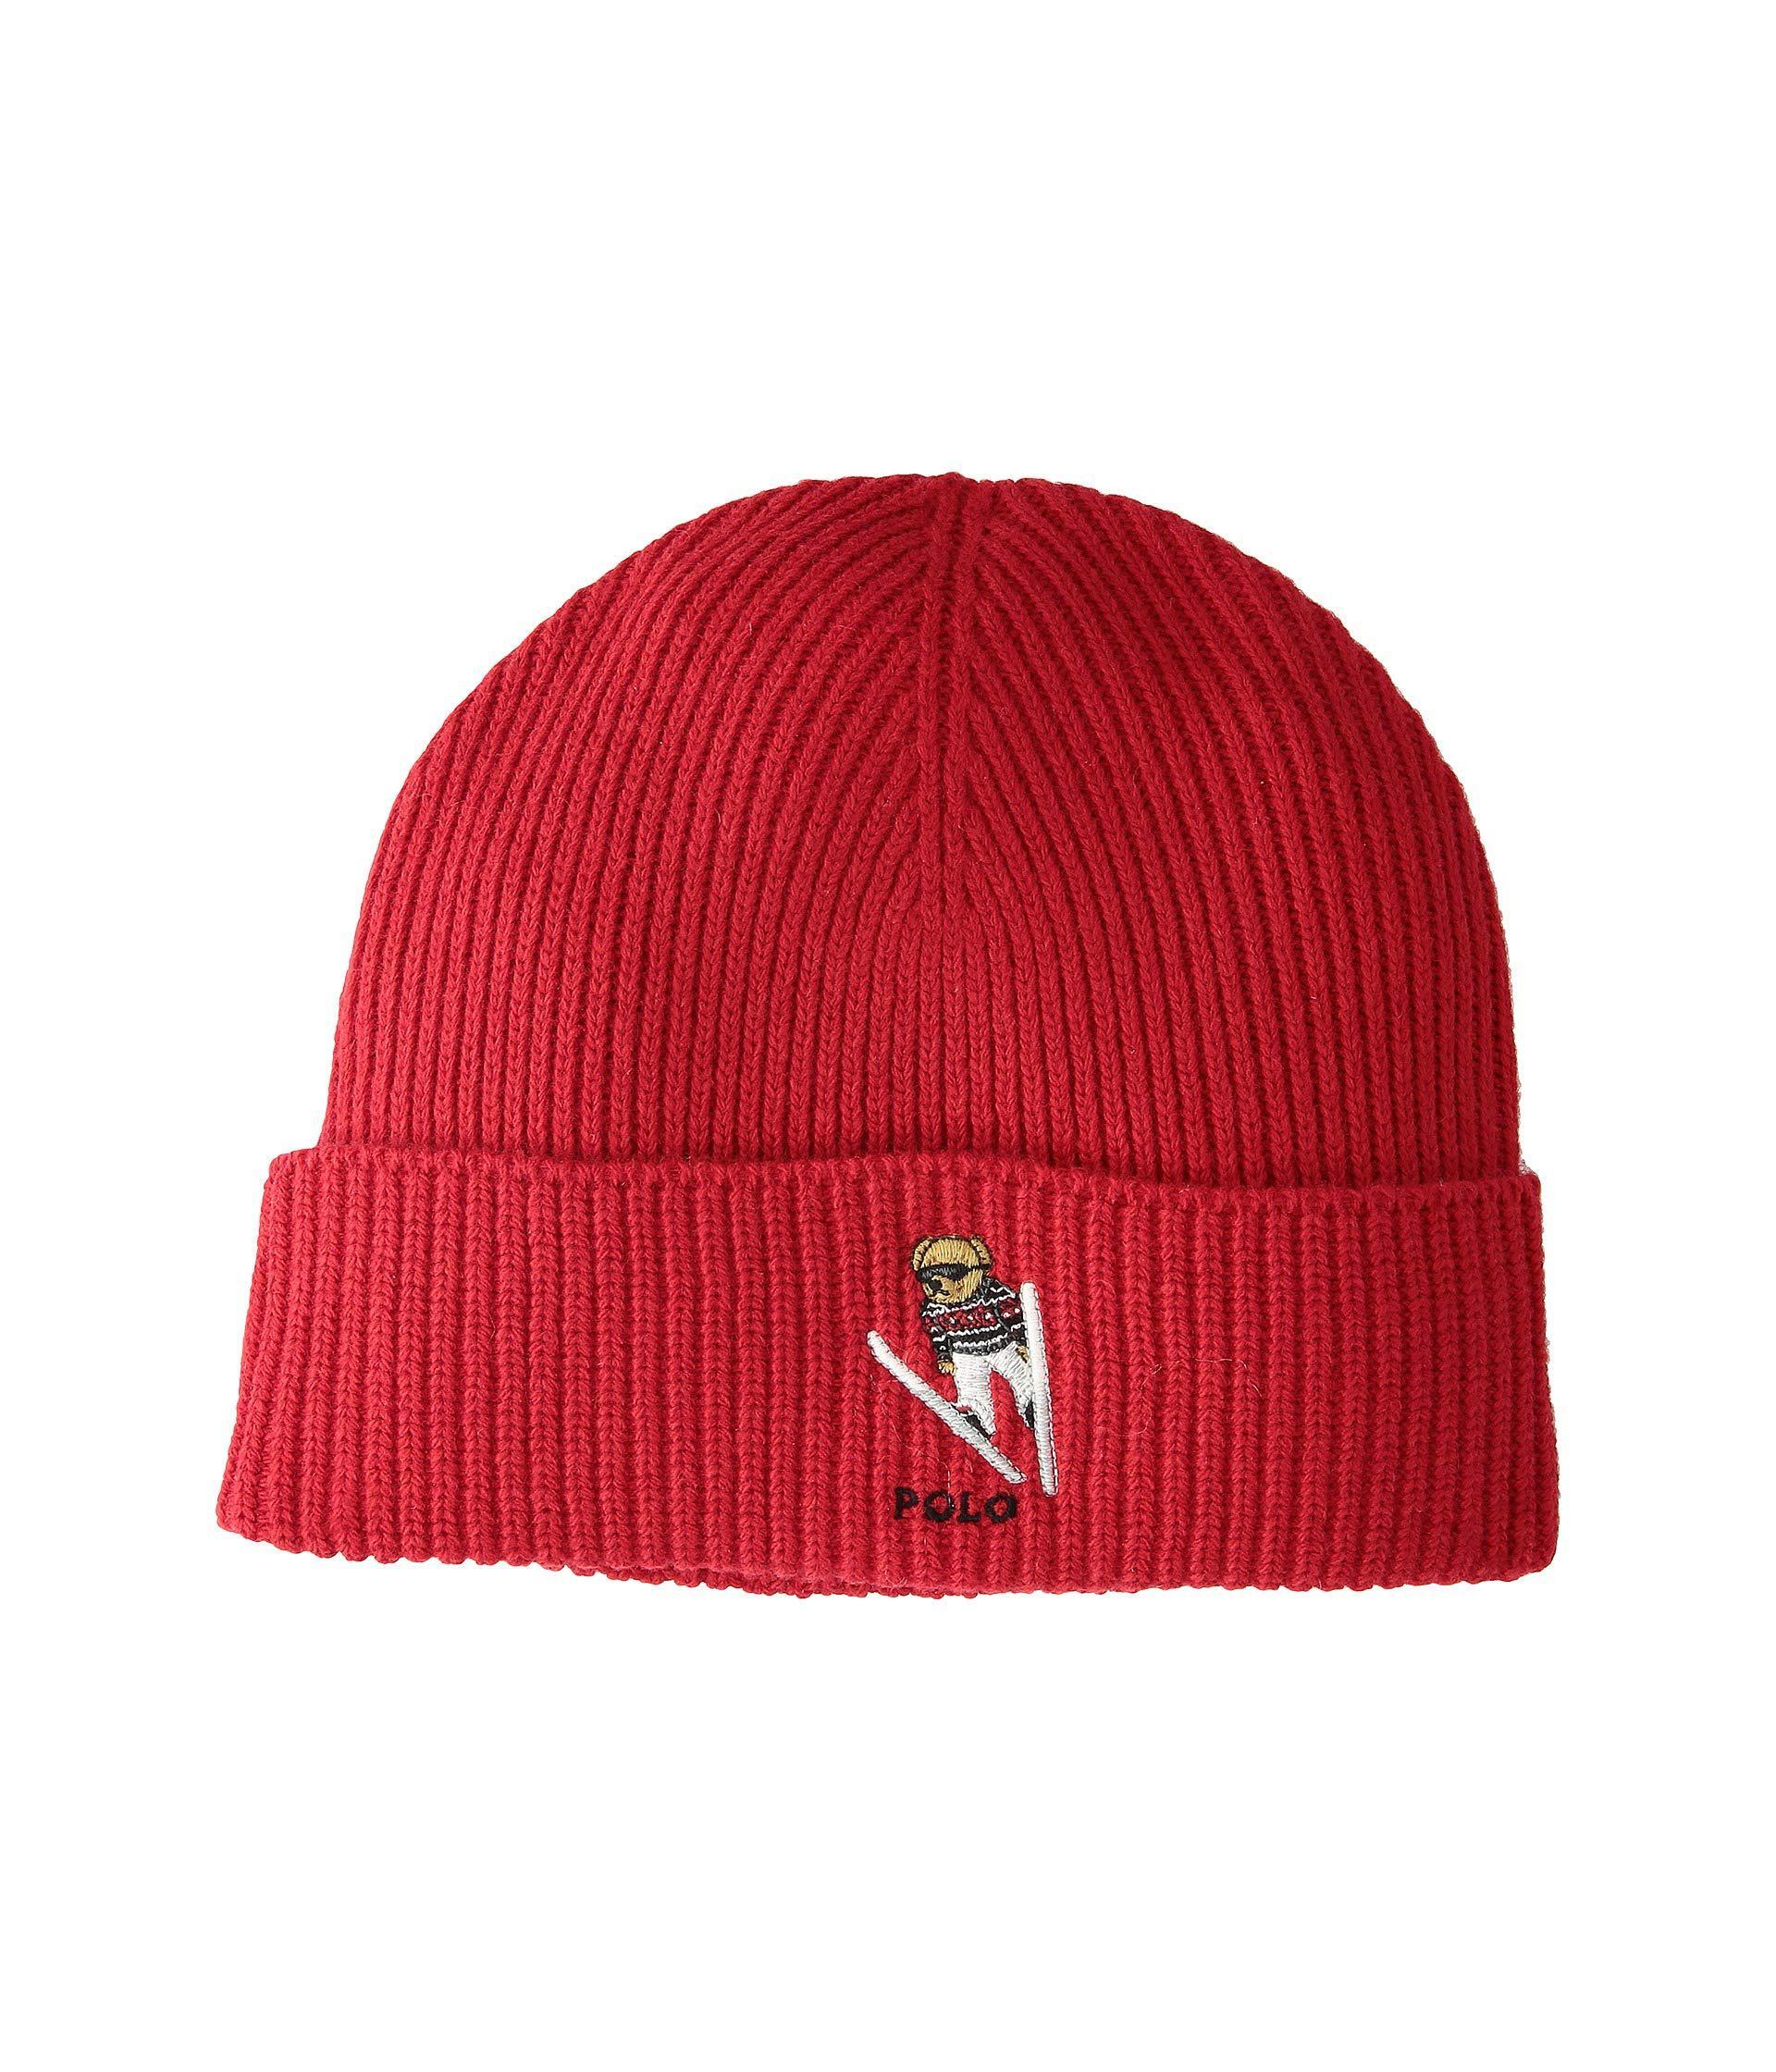 1b8d33a87a4 Lyst - Polo Ralph Lauren Skier Bear Cuff Hat (black) Beanies in Red ...